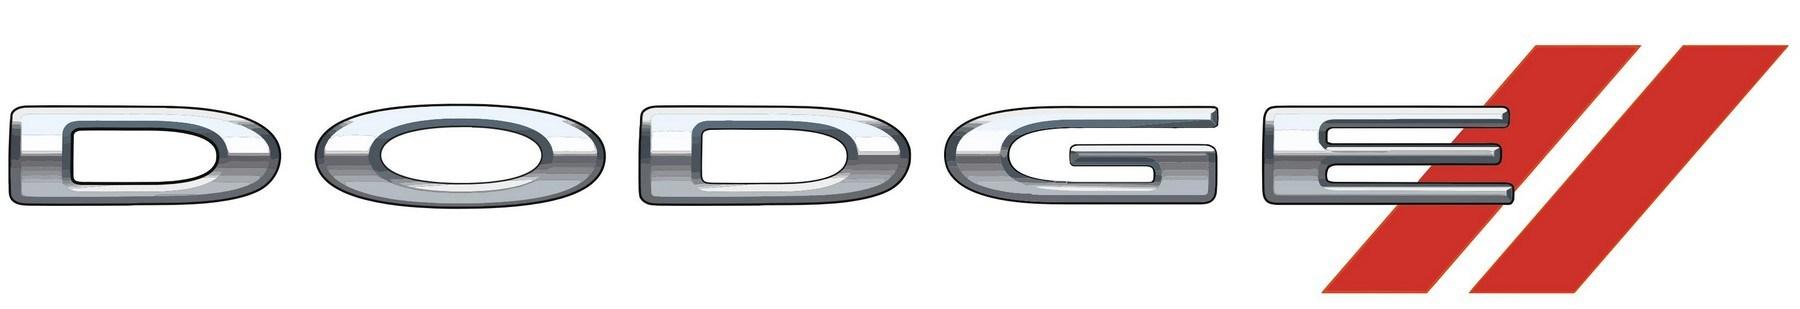 Dodge Logo [EPS-PDF] Vector EPS Free Download, Logo, Icons, Brand Emblems